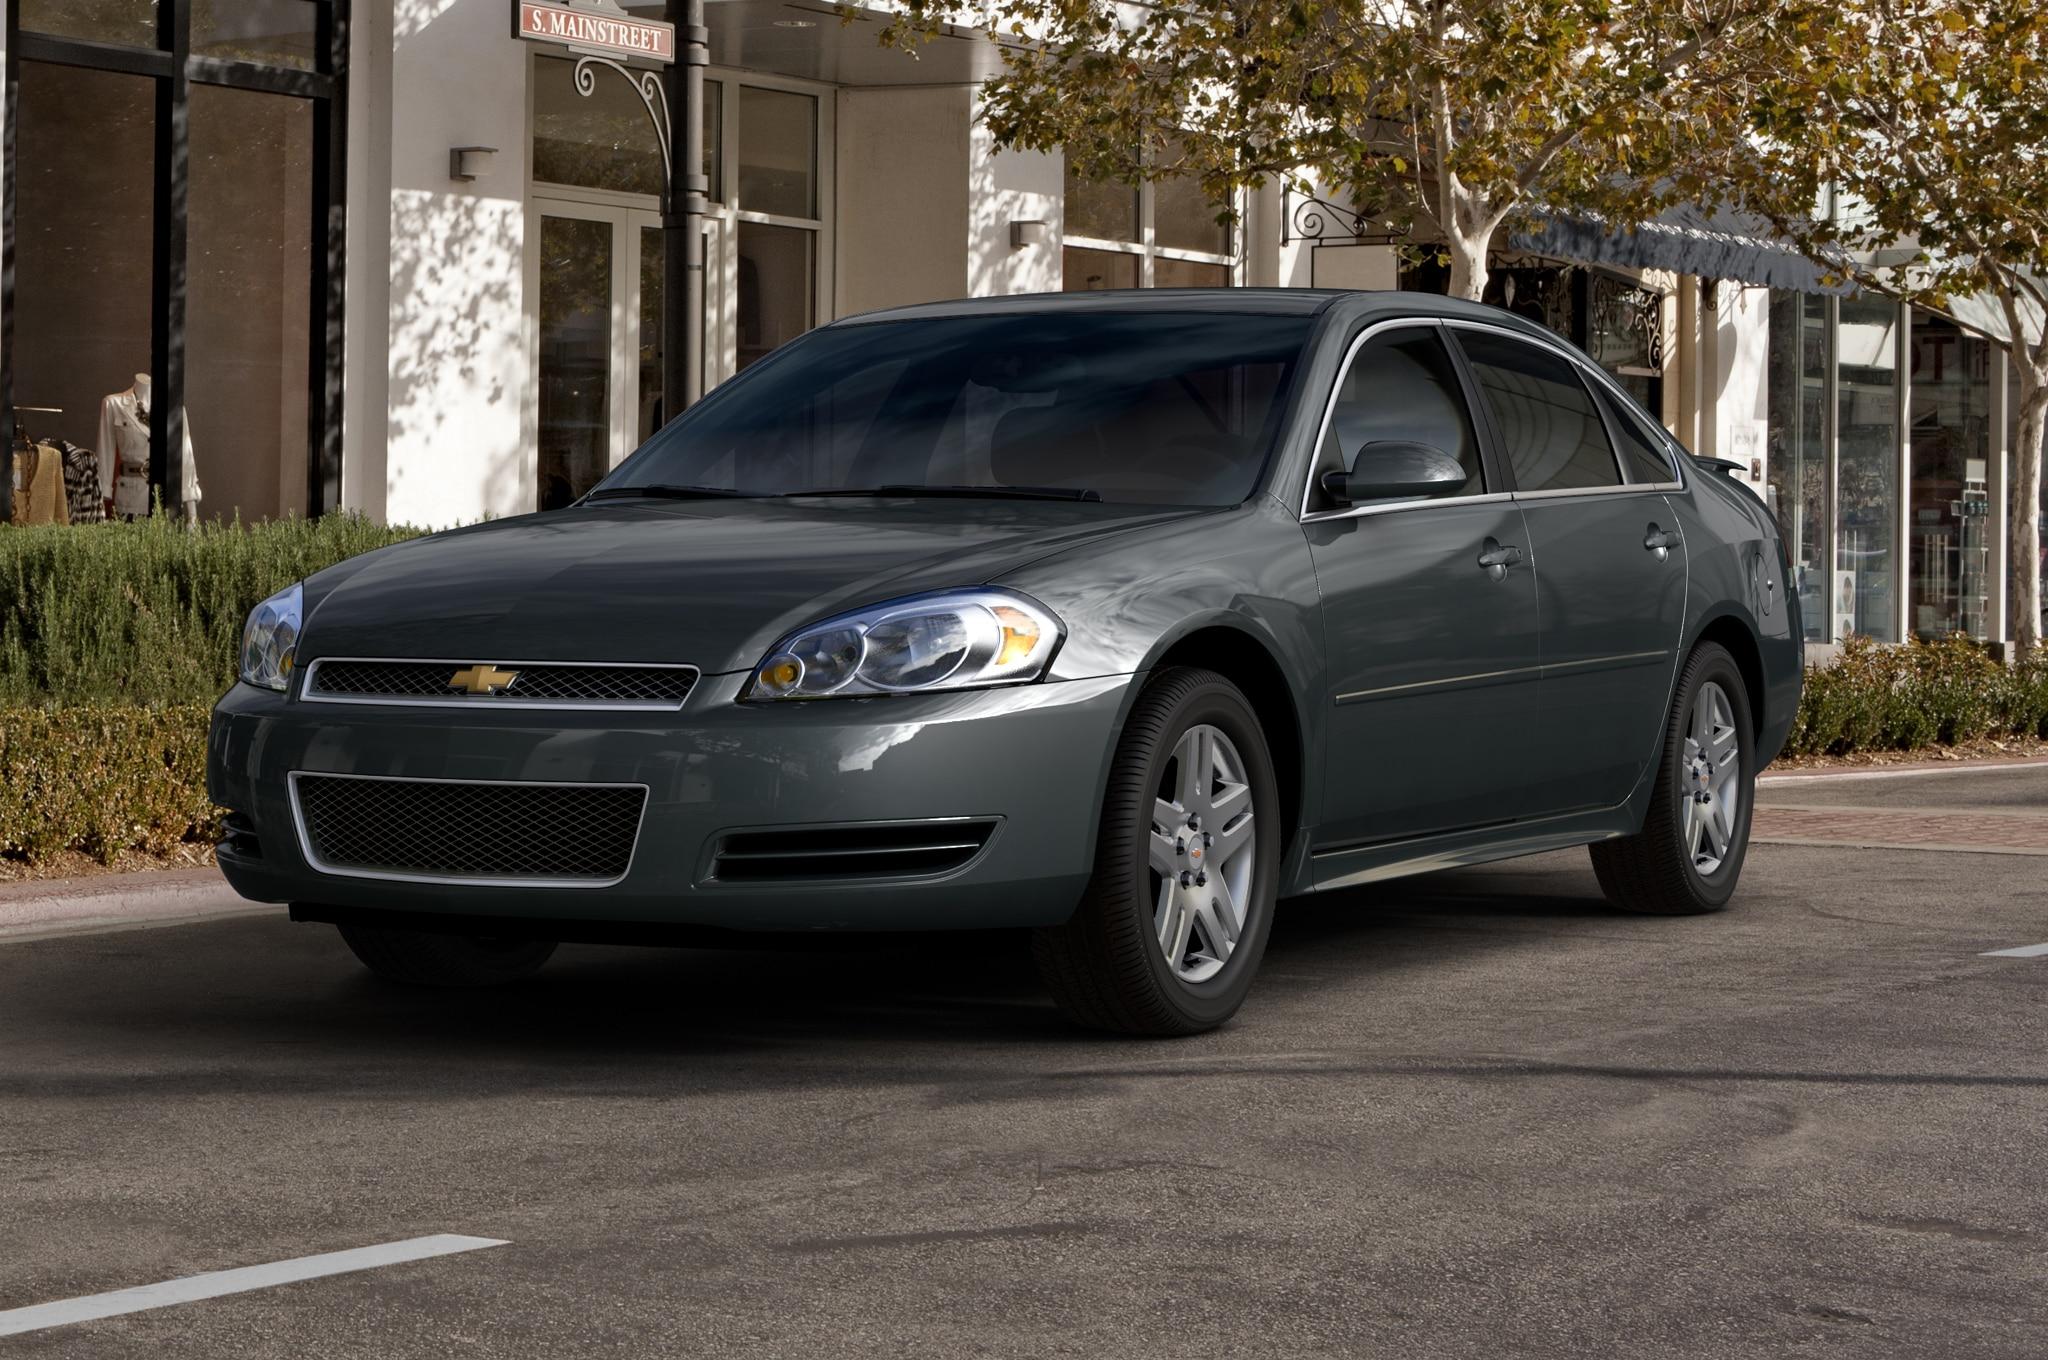 2013 Impala Front Three Quarters1